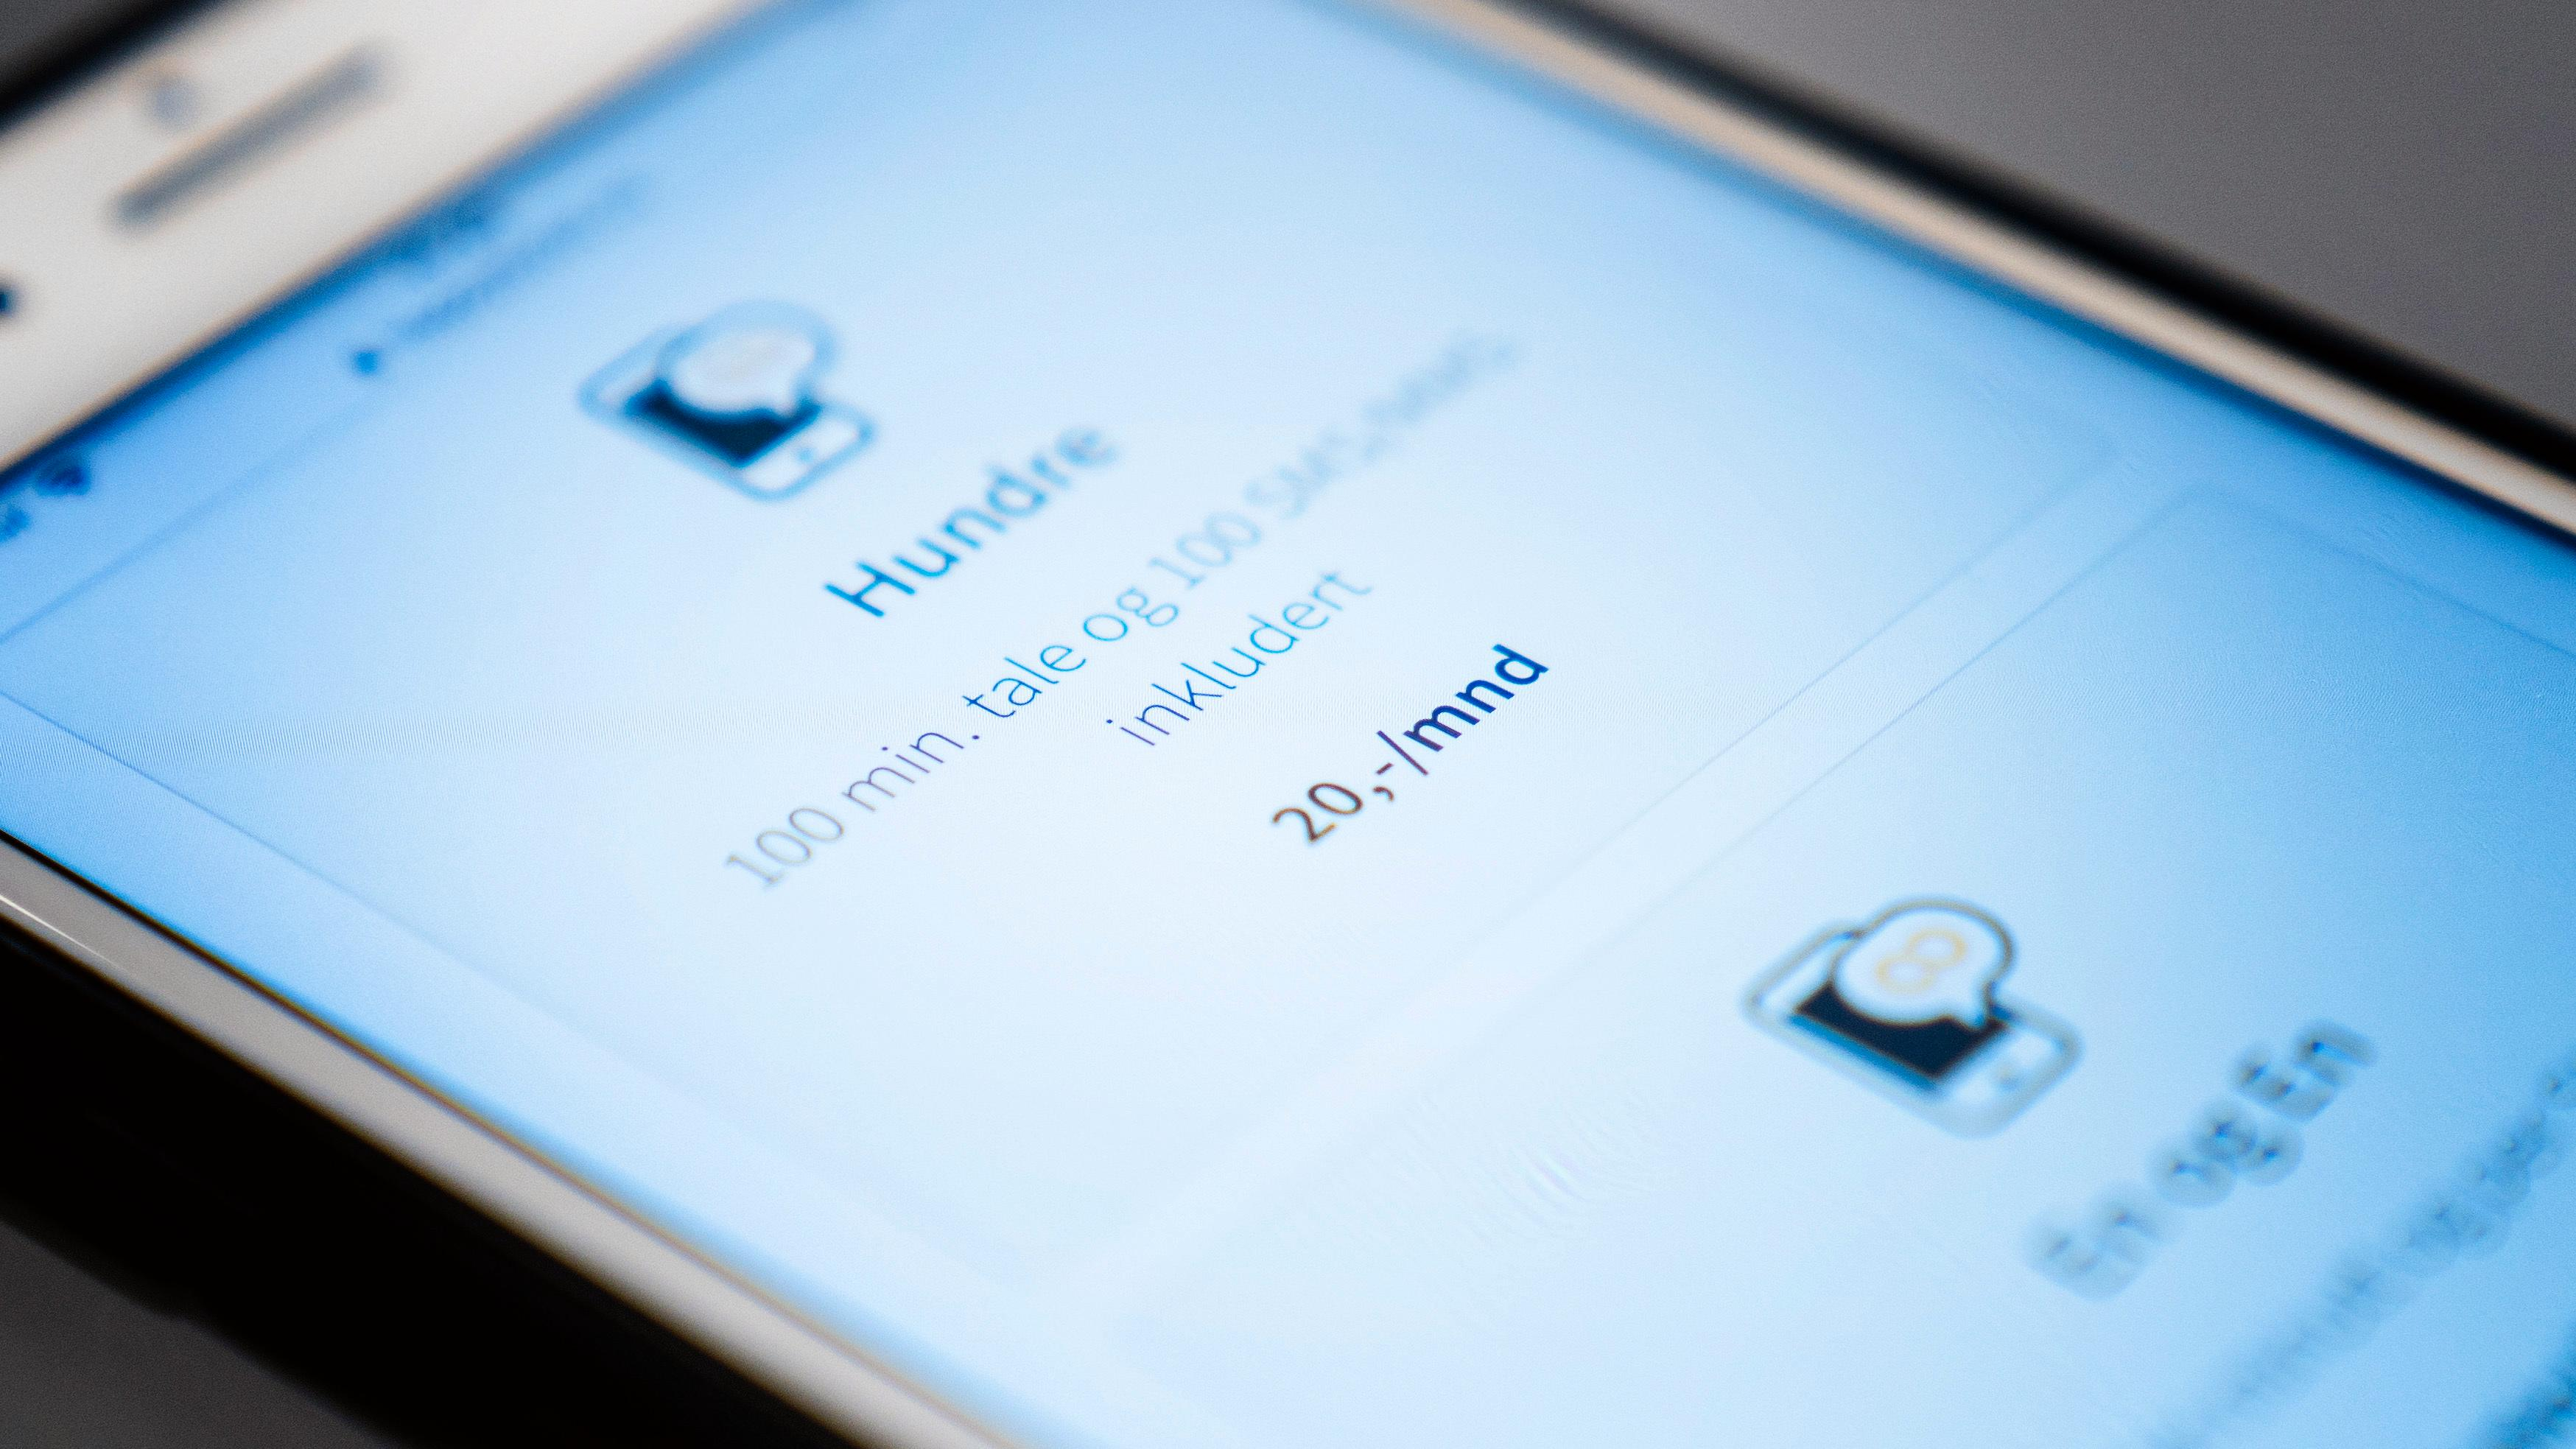 Nå kan du få mobilabonnement til 20 kroner i måneden